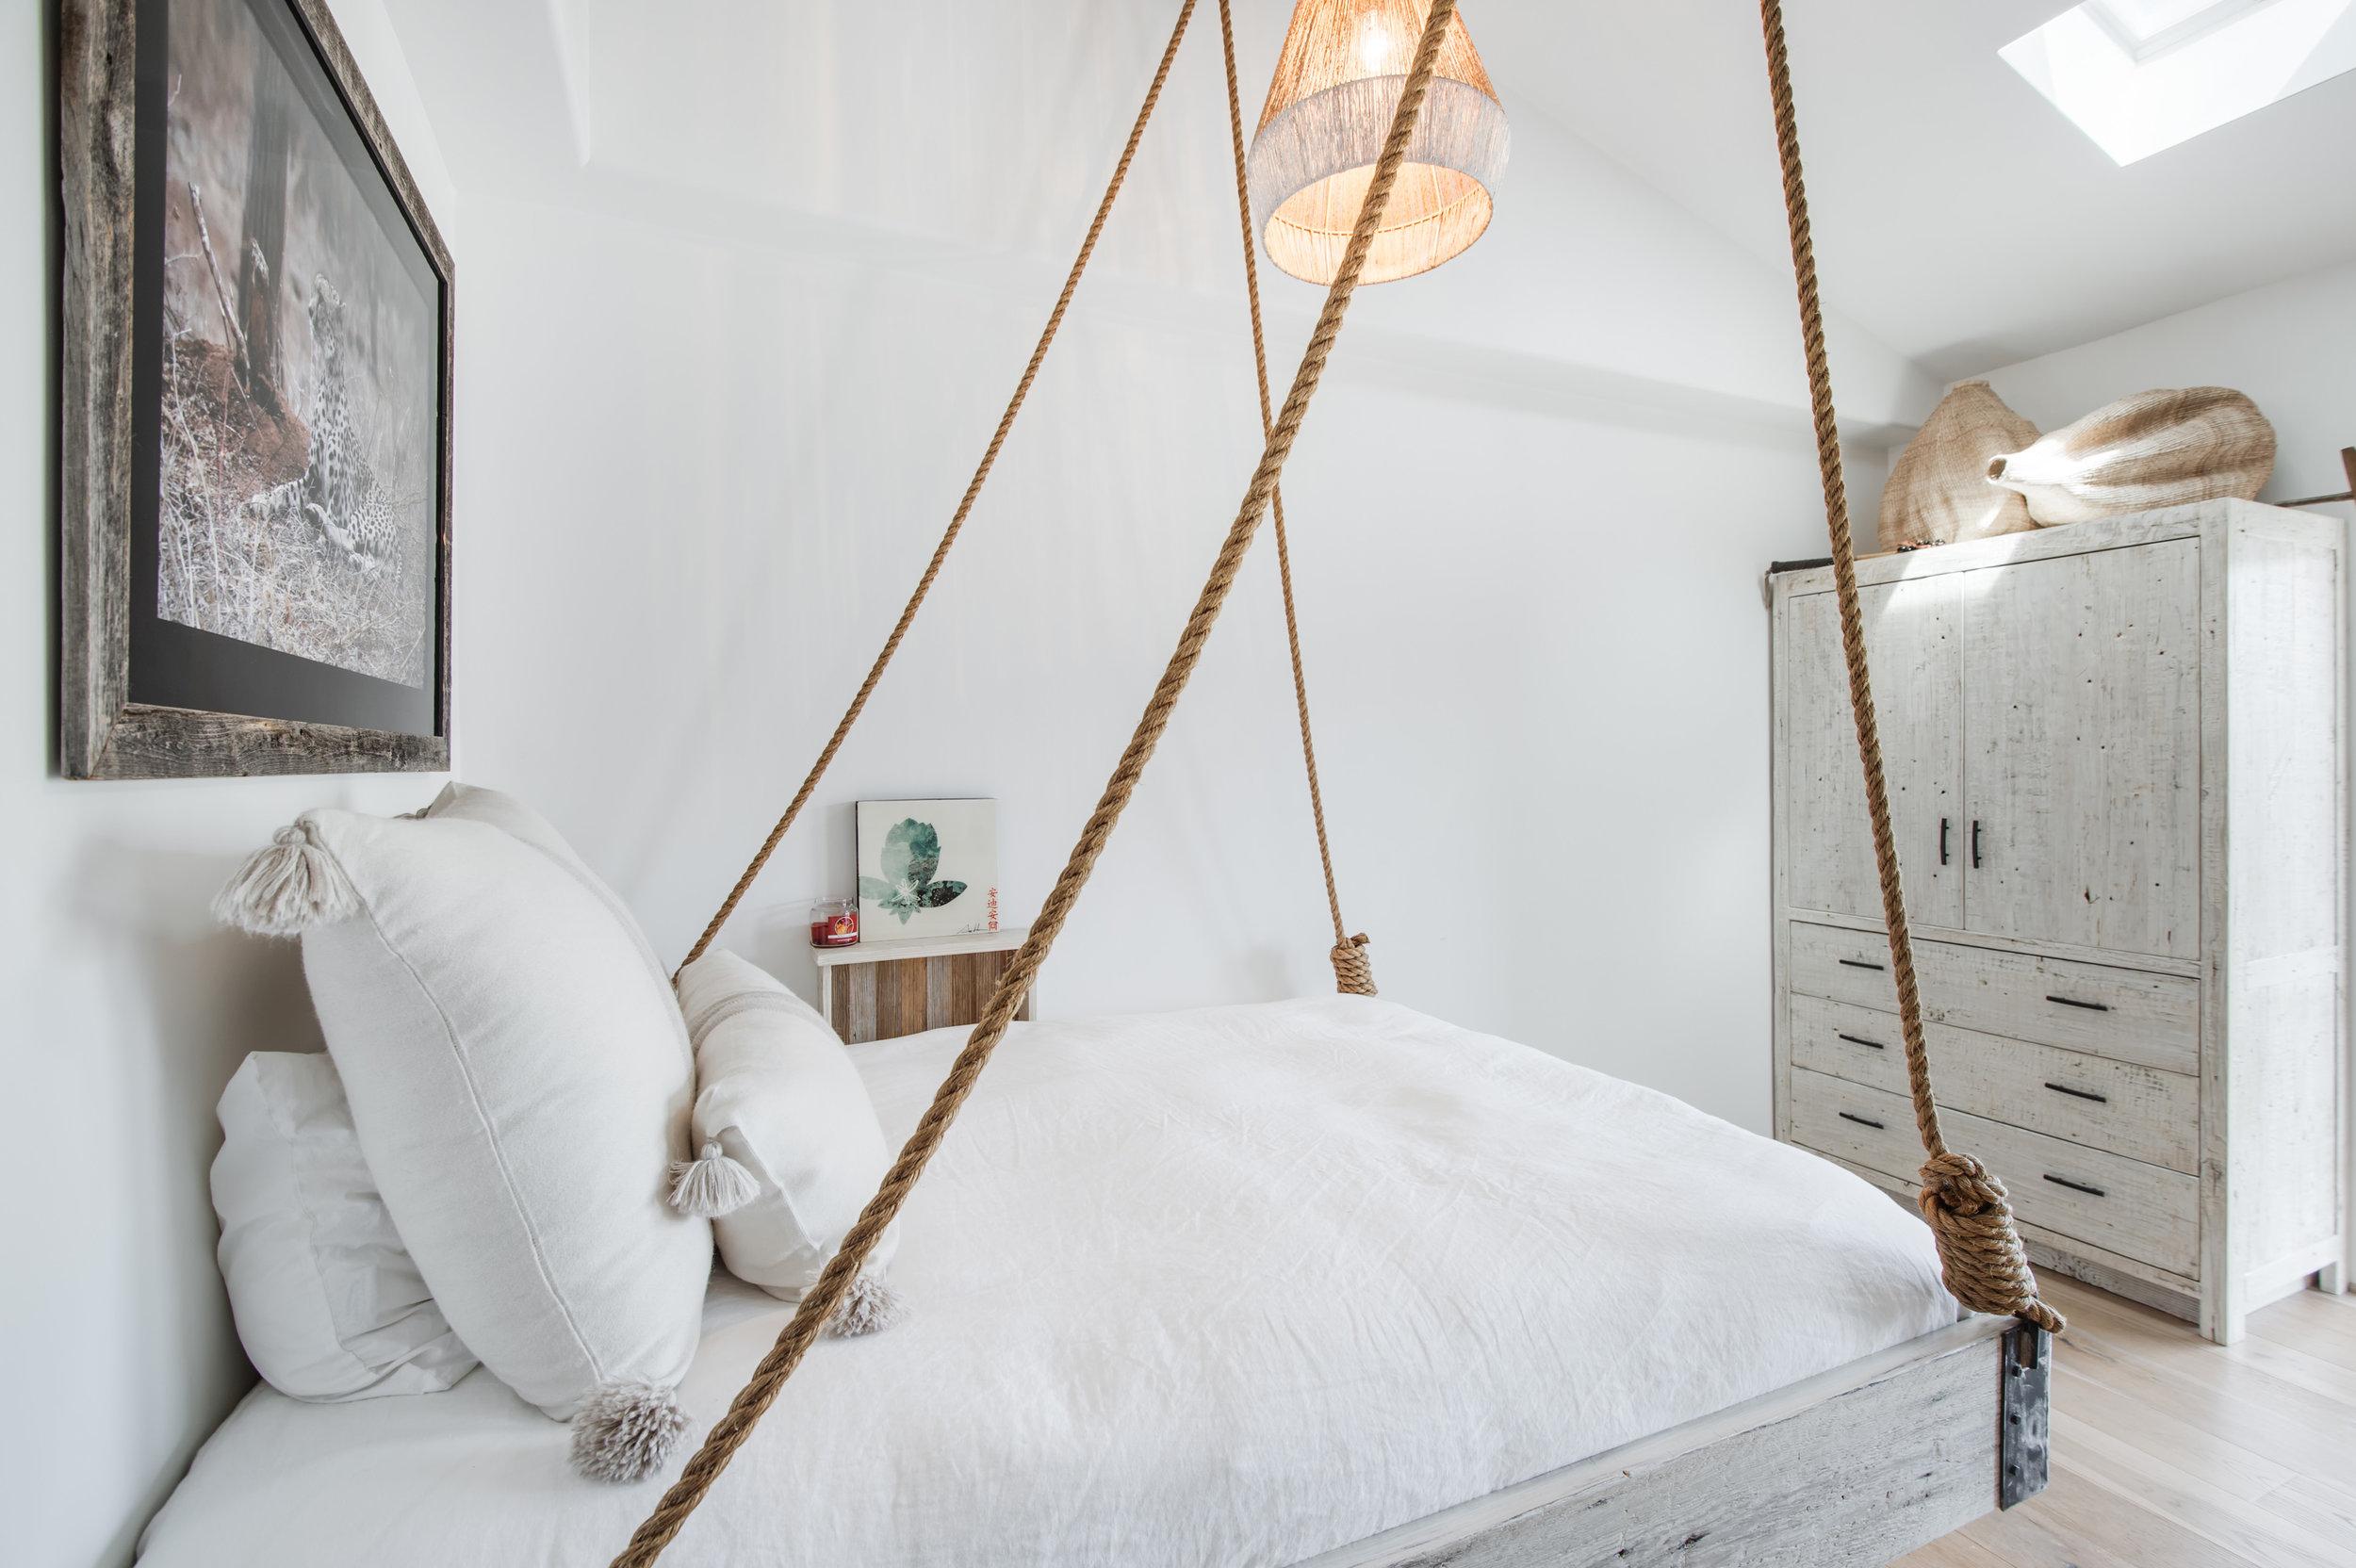 025 Bedroom 26272 Cool Glen Way Malibu For Sale Luxury Real Estate.jpg